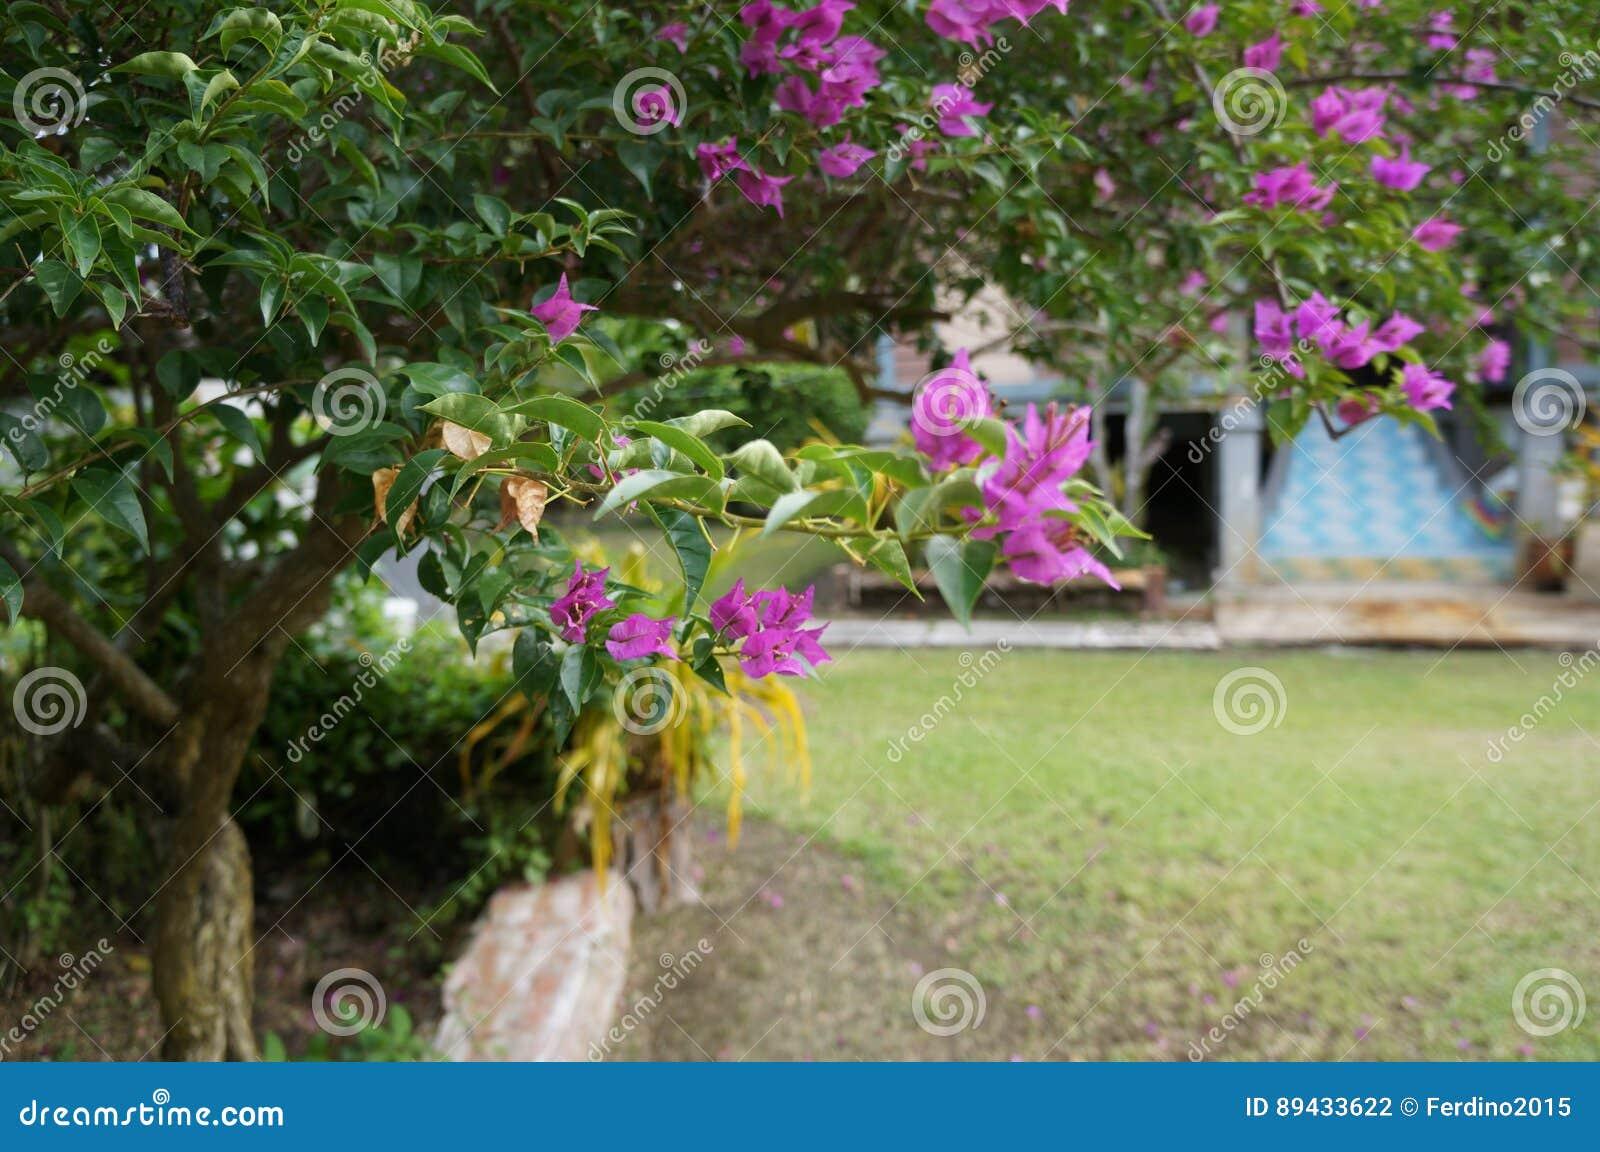 Bougainvillea Spectabilis Pink Purple Flowers Plant Asia Malaysia